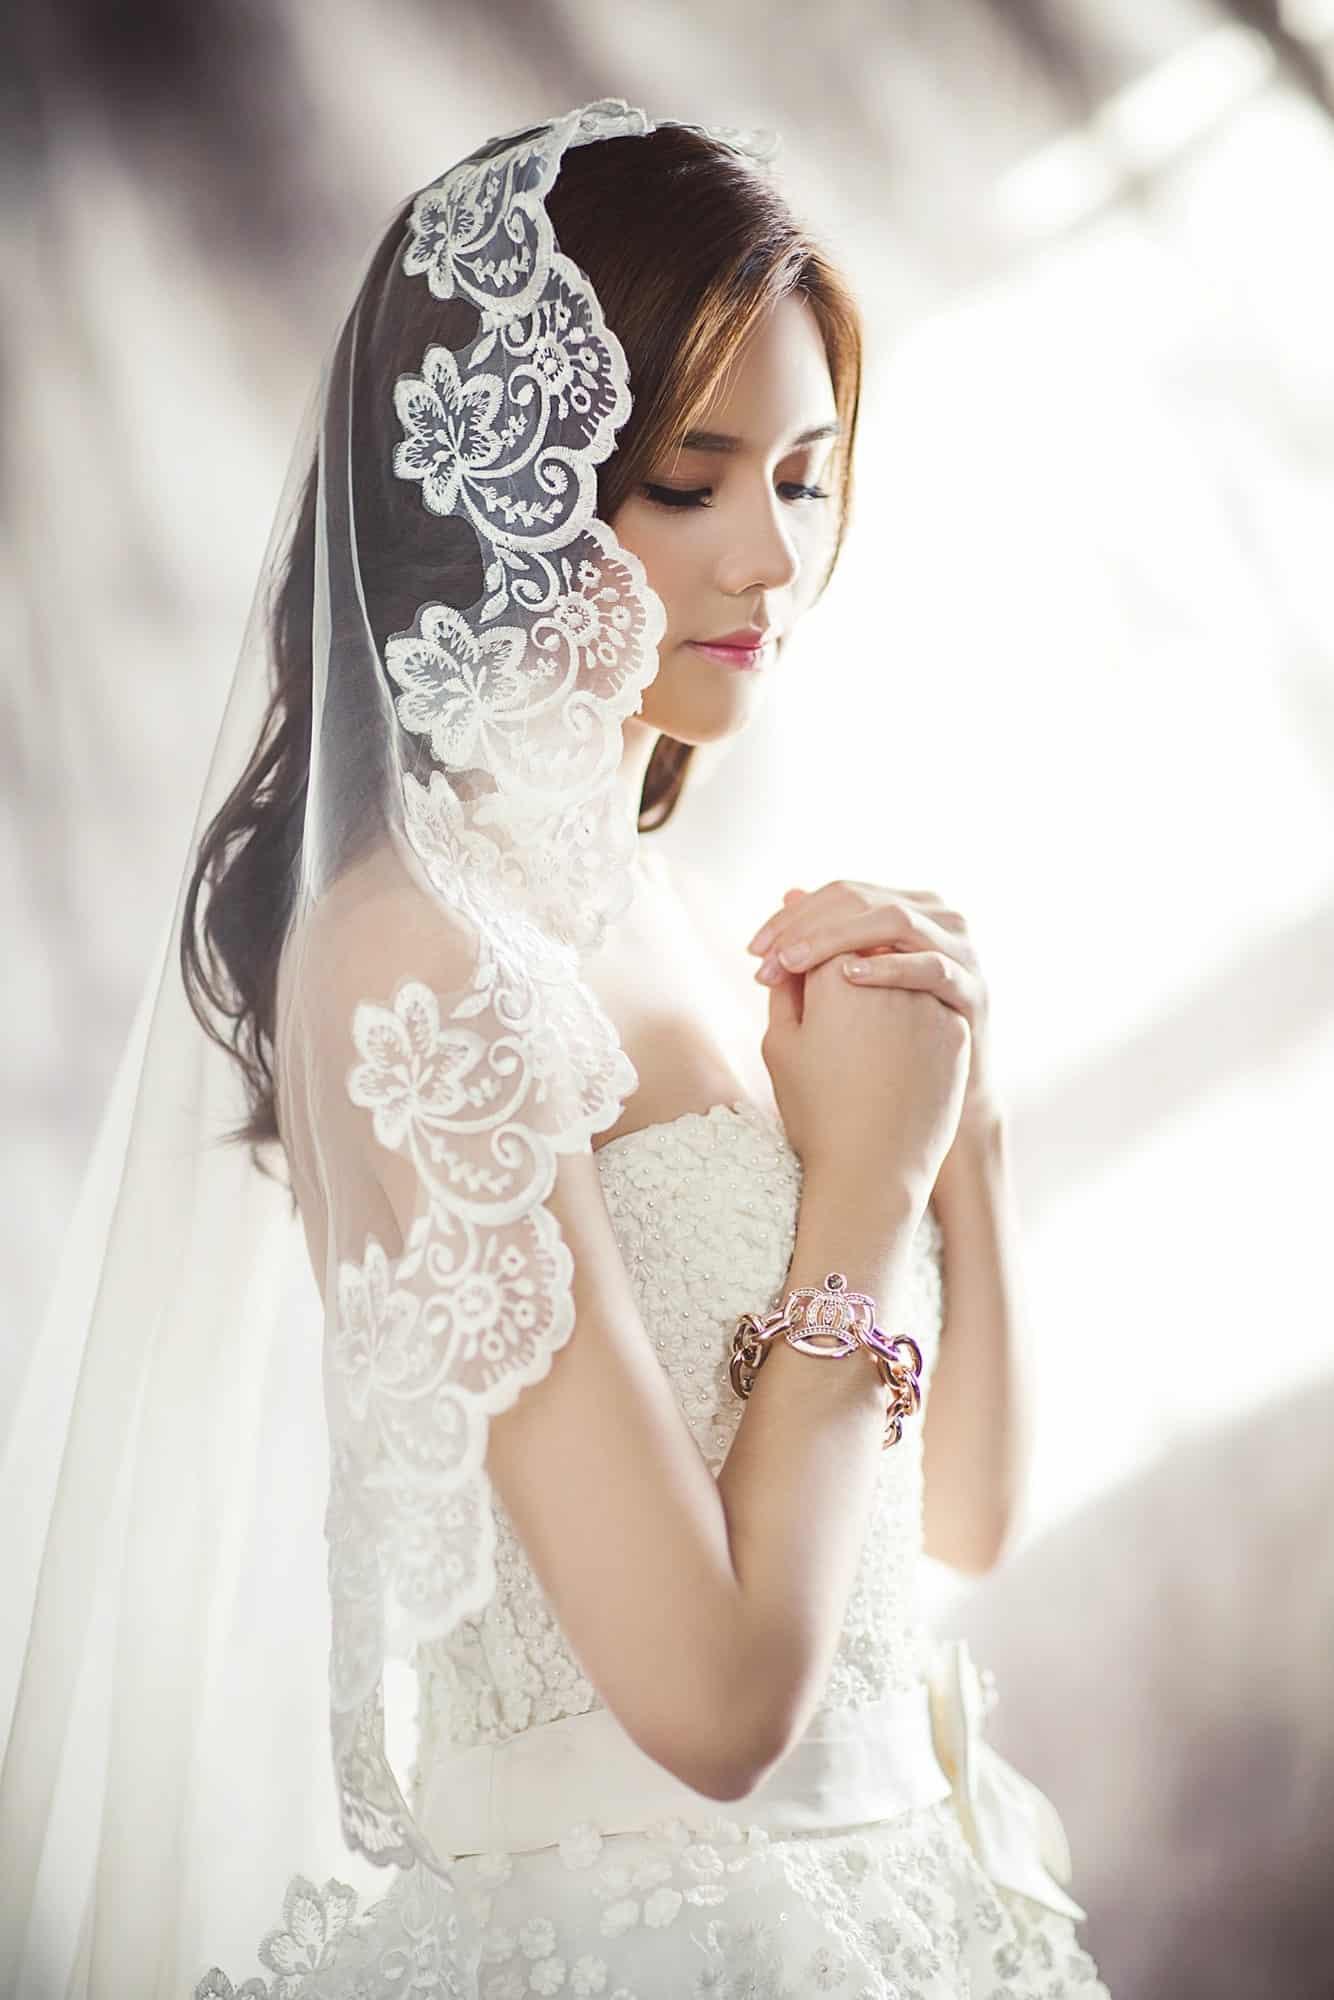 Wedding Clothing Idea